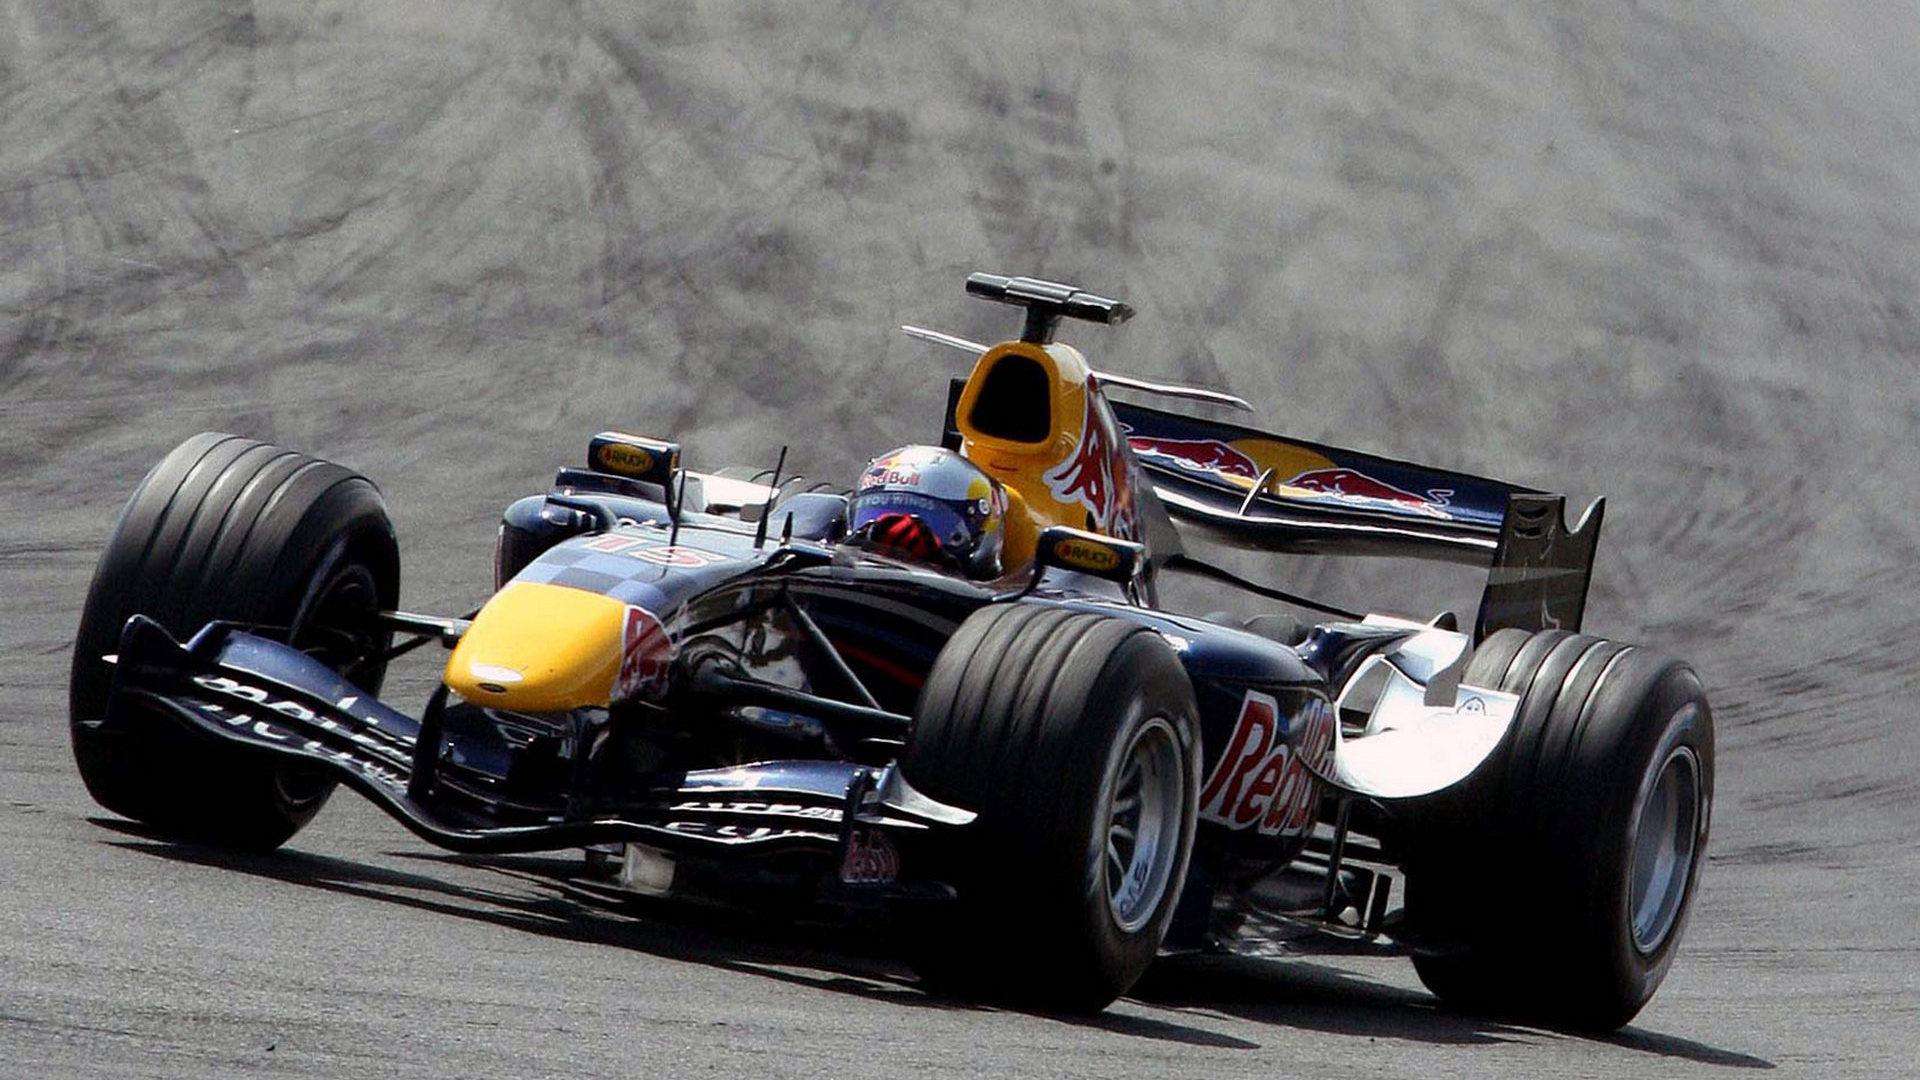 Hd Wallpapers 2006 Formula 1 Grand Prix Of Germany F1